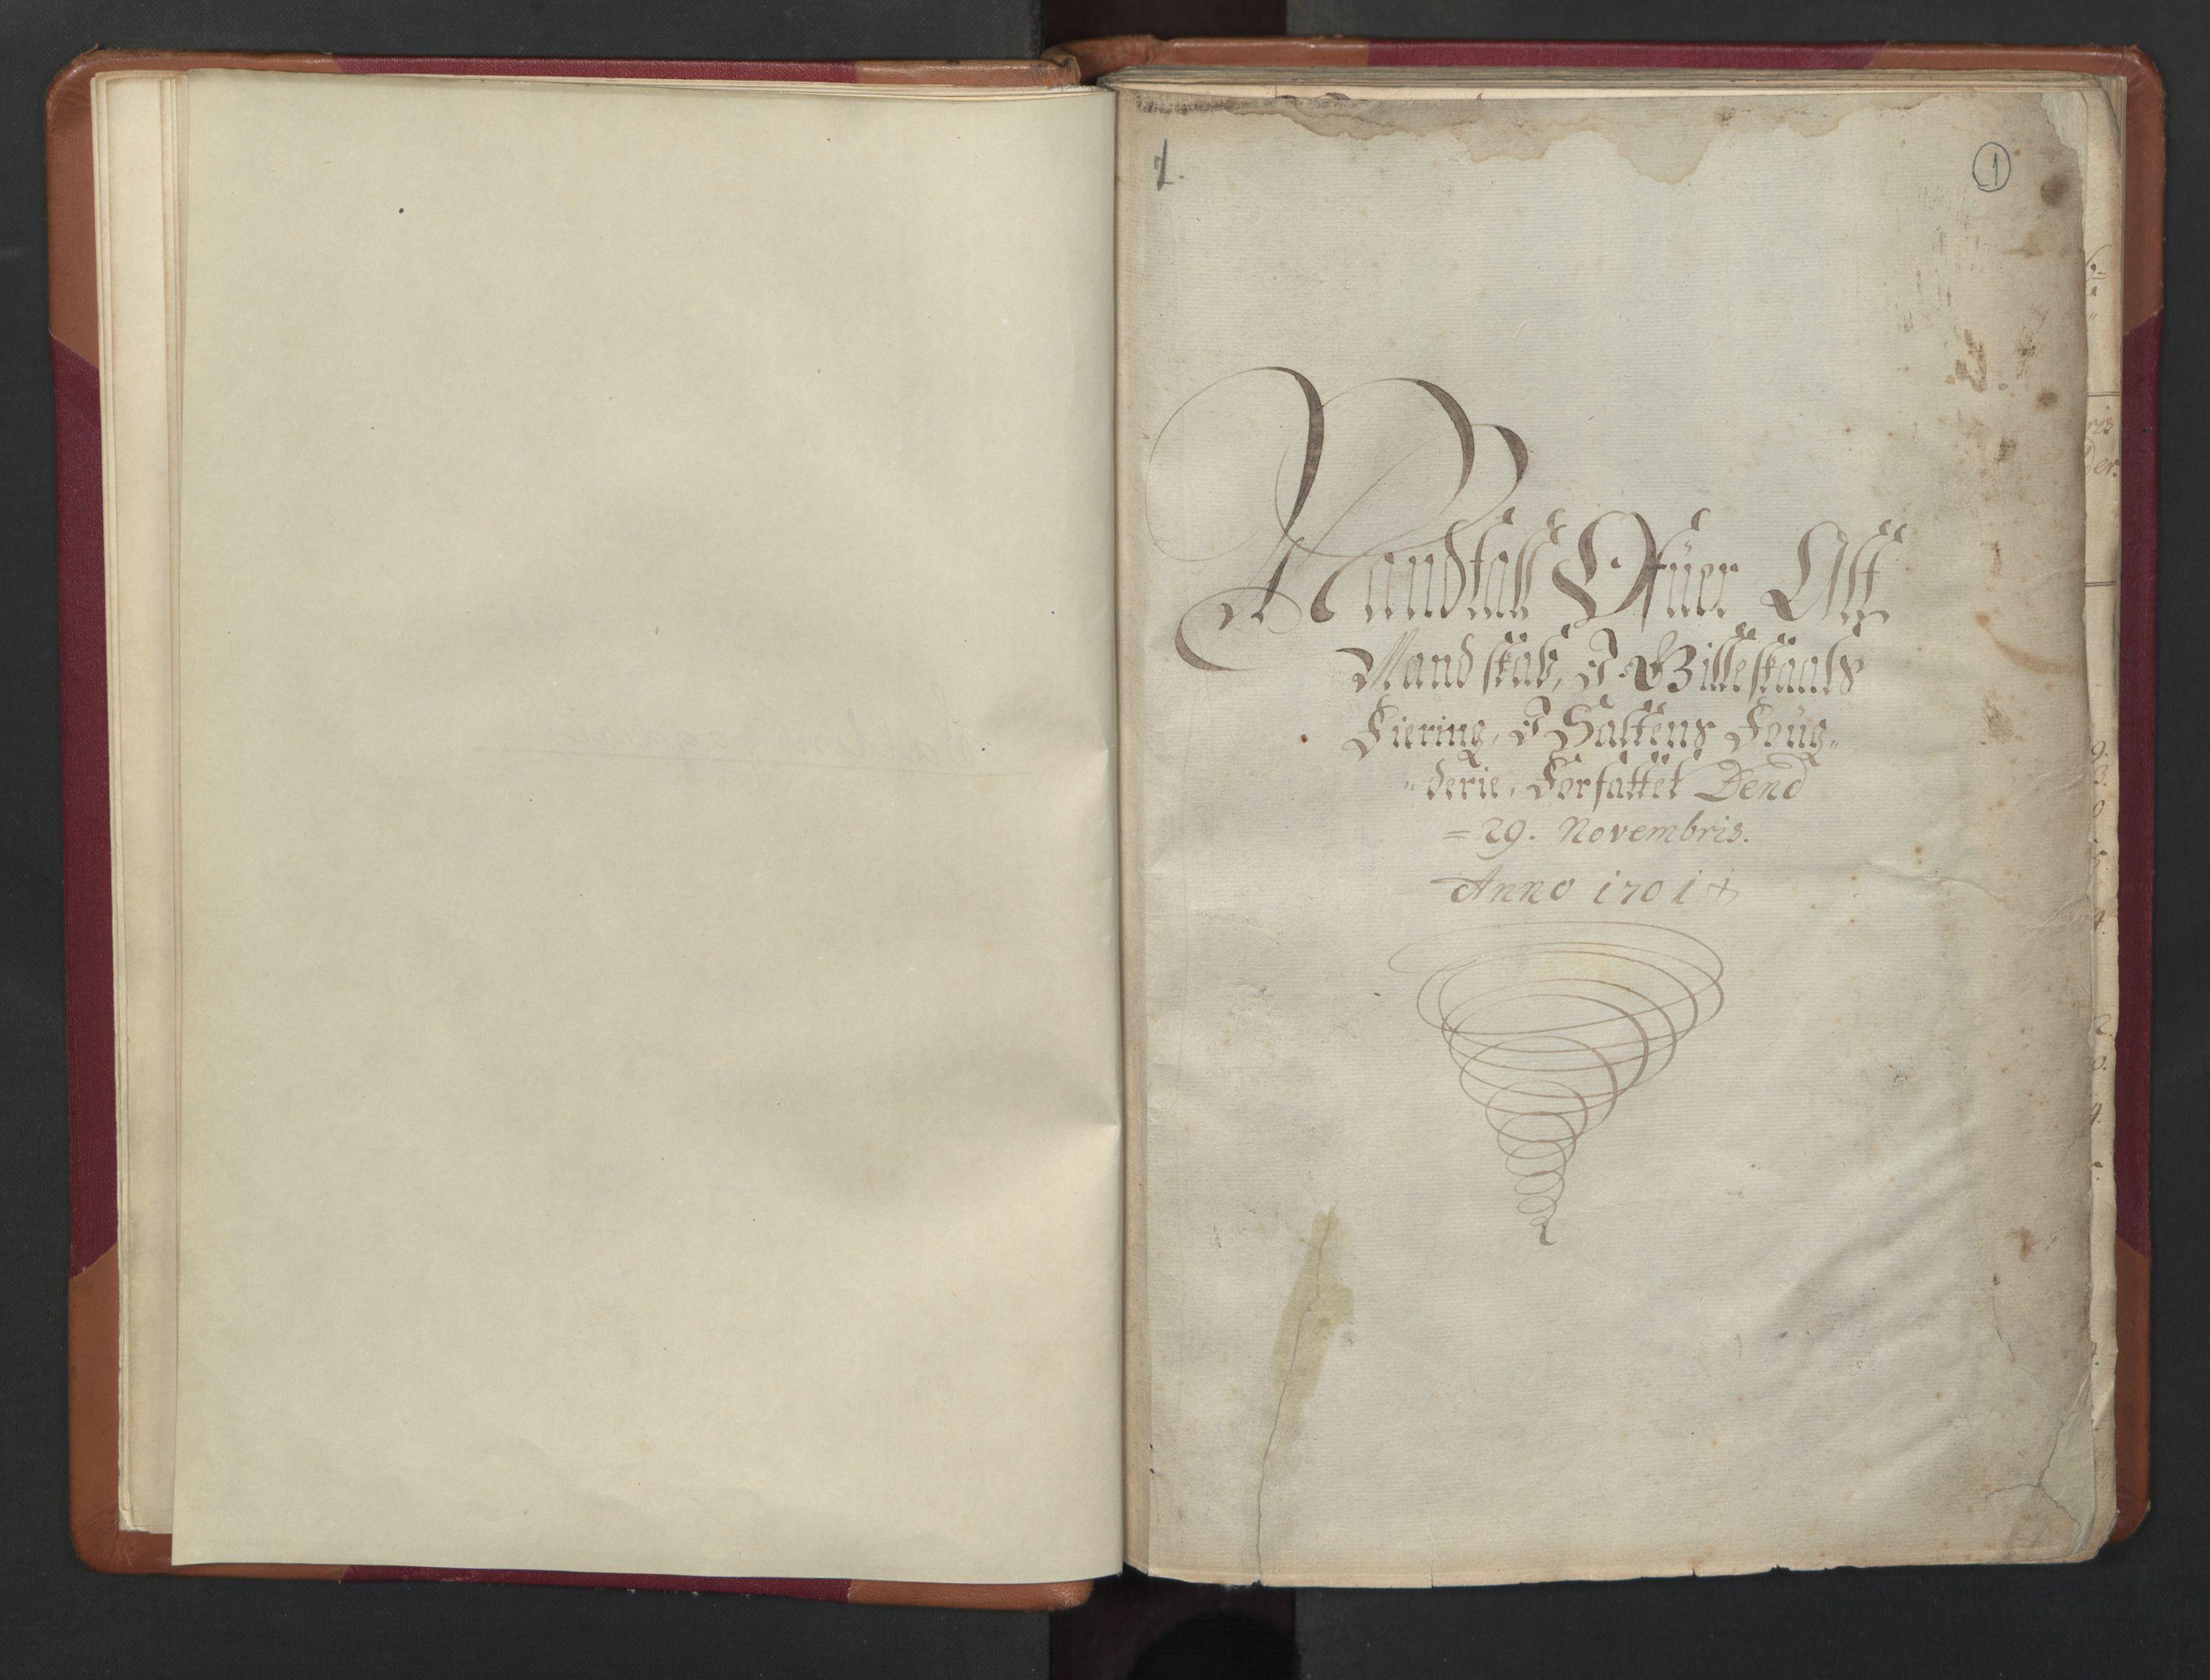 RA, Manntallet 1701, nr. 17: Salten fogderi, 1701, s. 1